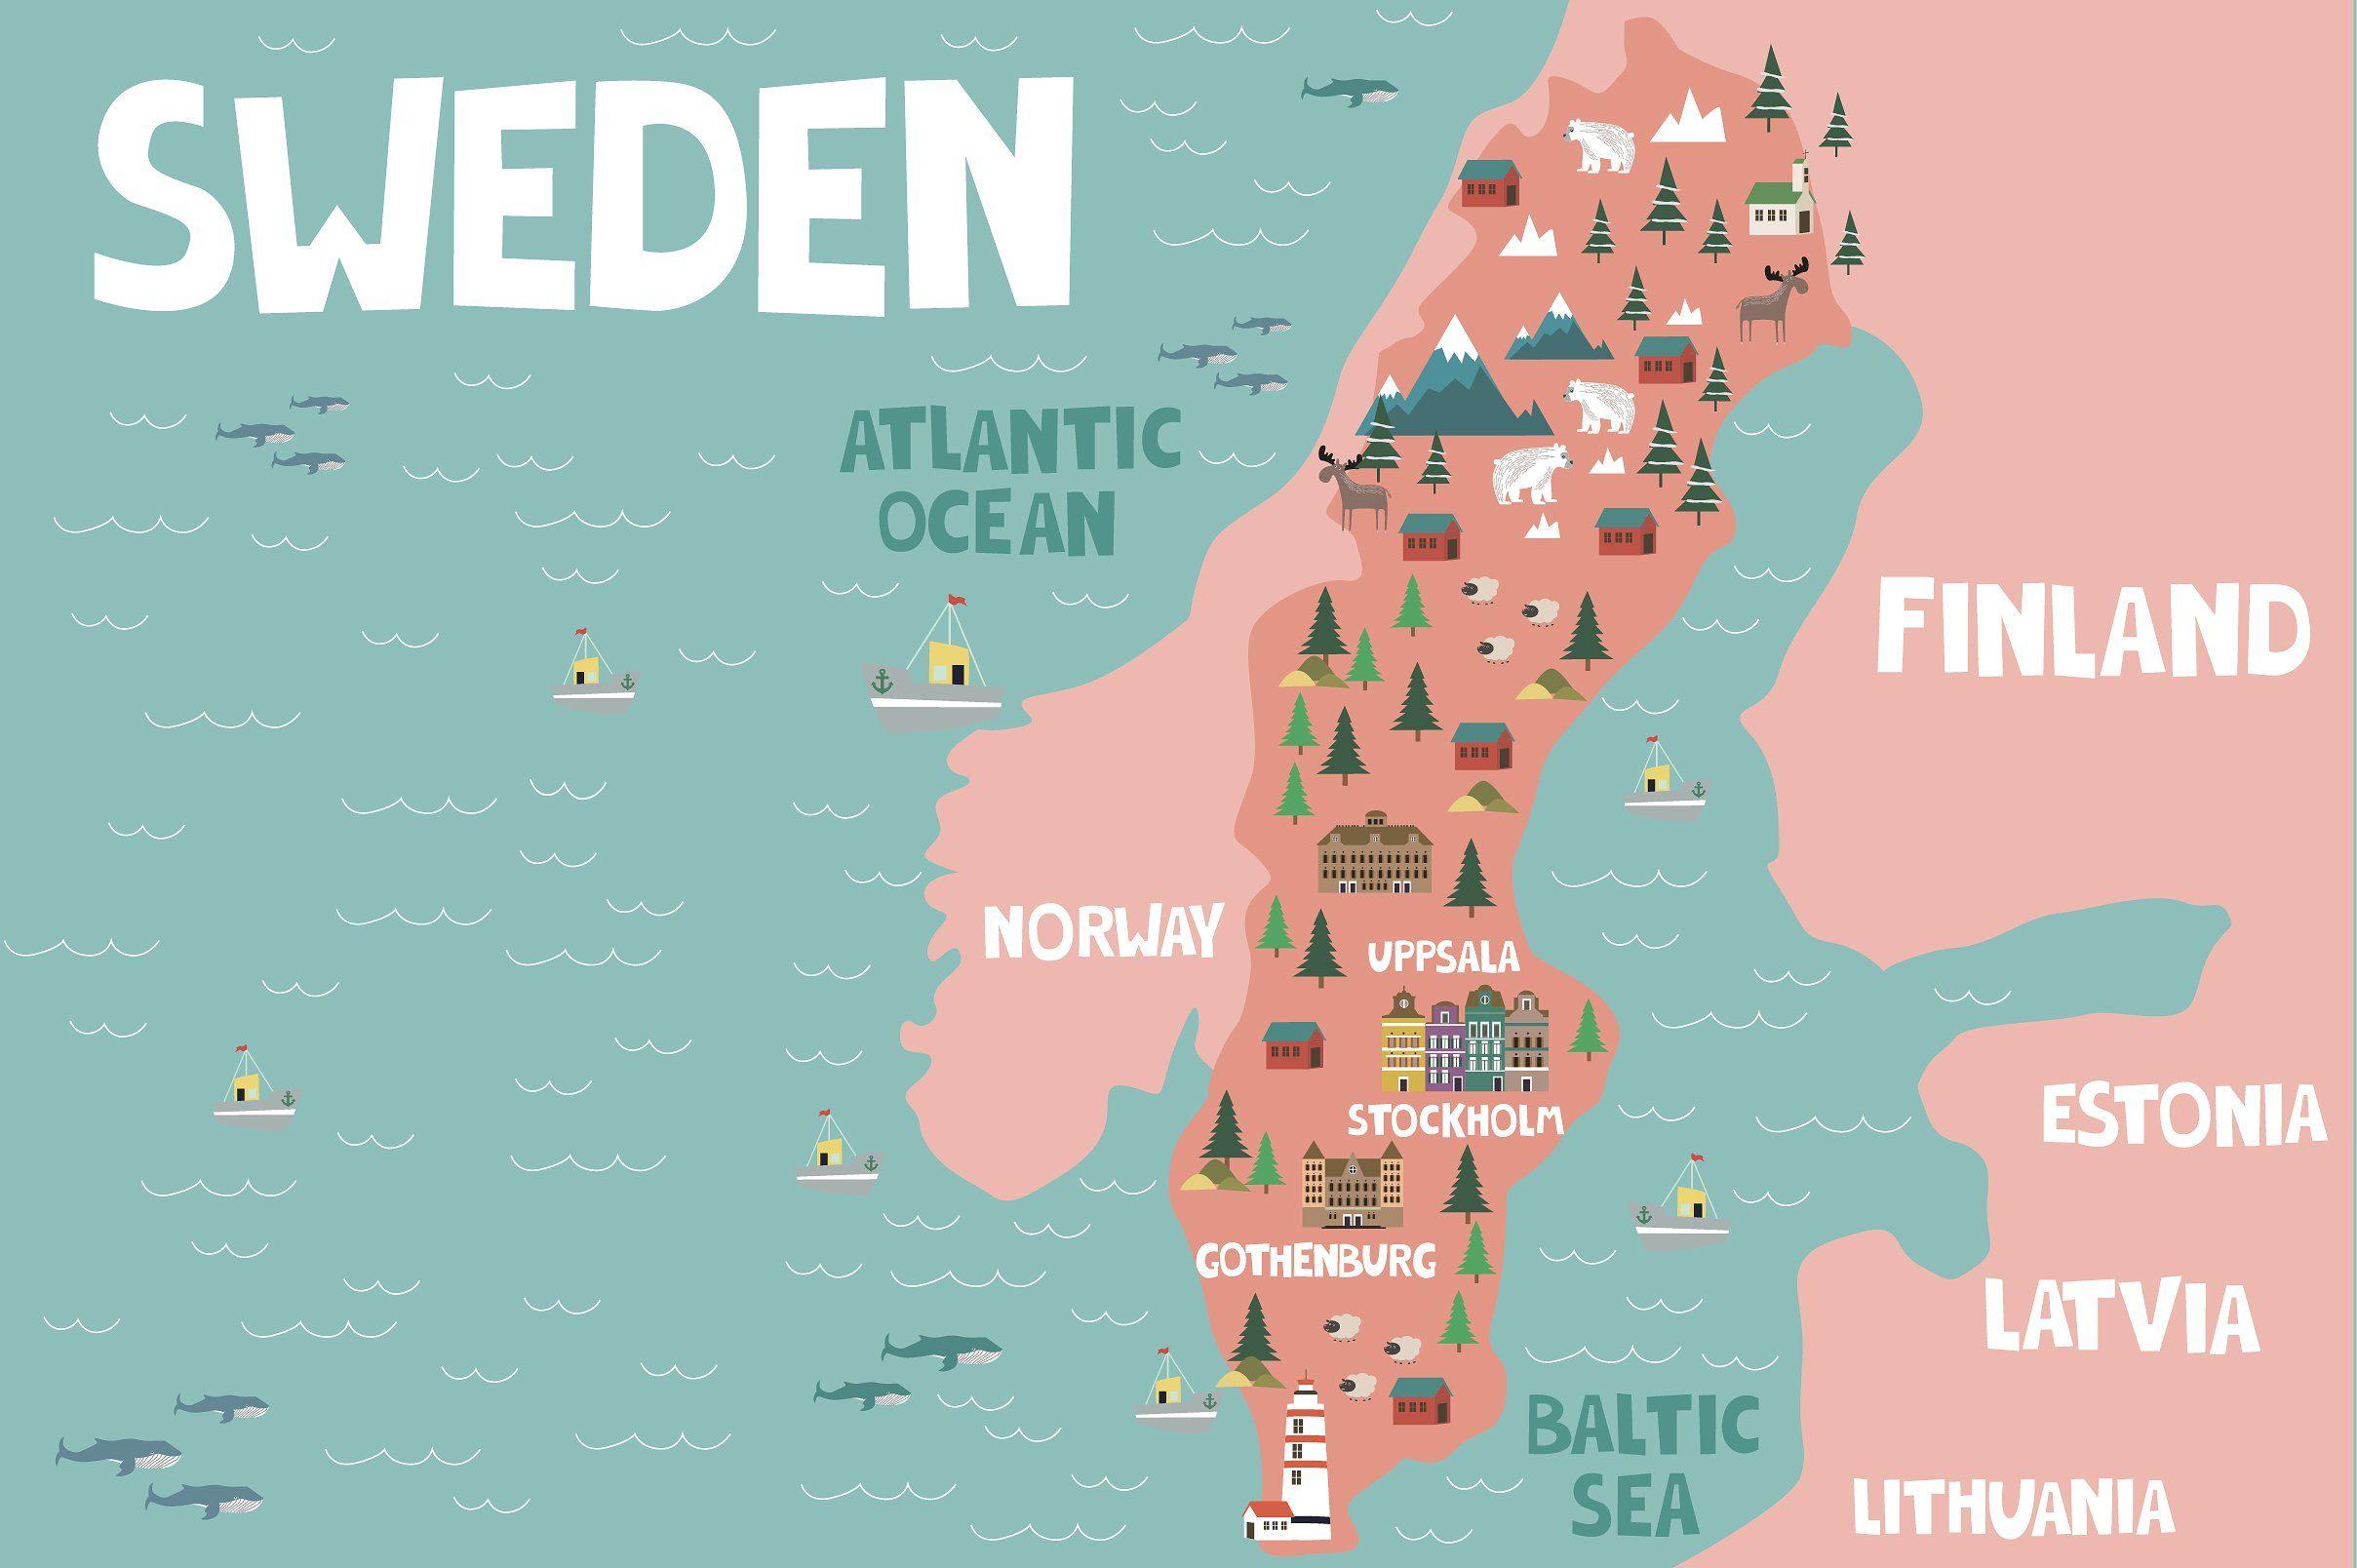 Illustration Maps Part 3 Illustrated Map Sweden Map City Maps Illustration